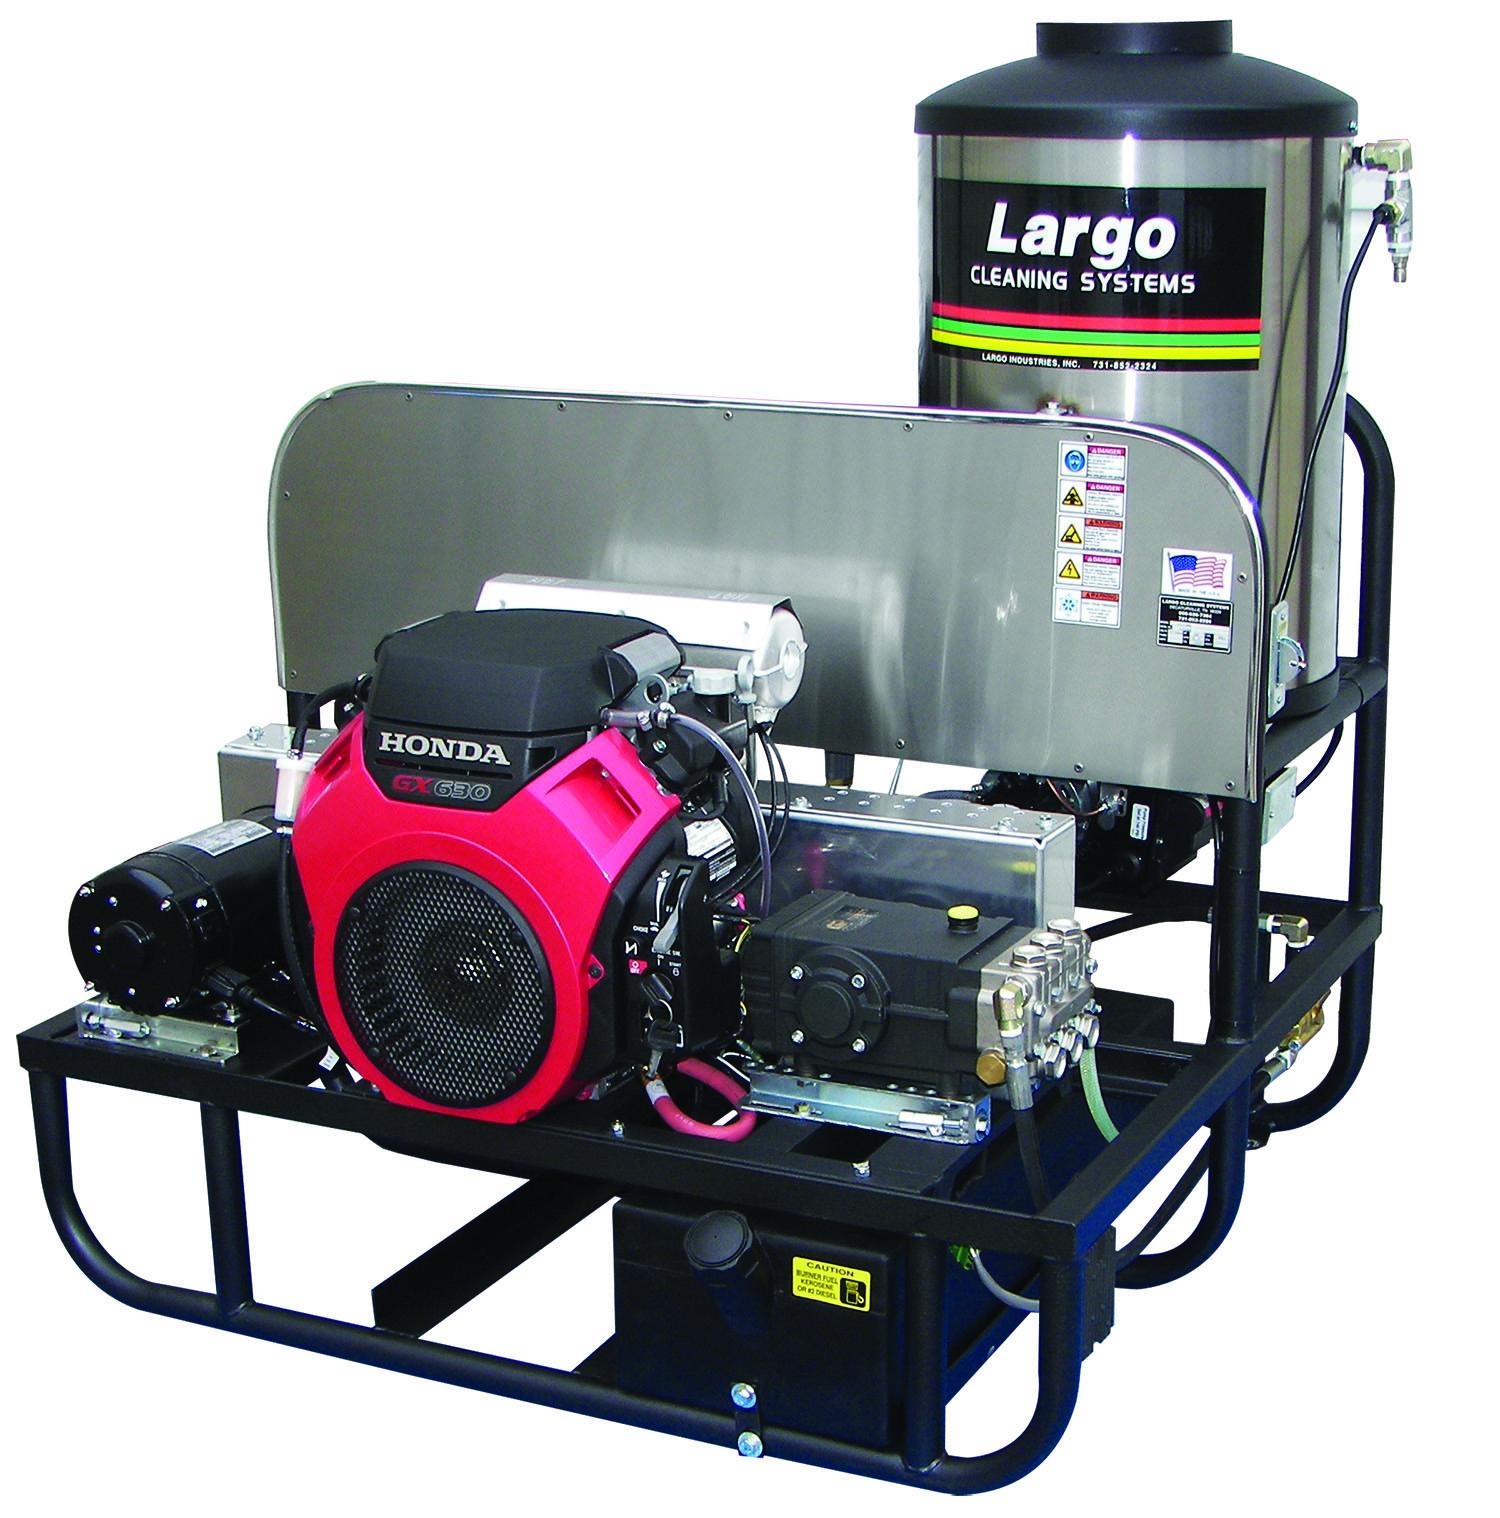 Largo Pressure Washers